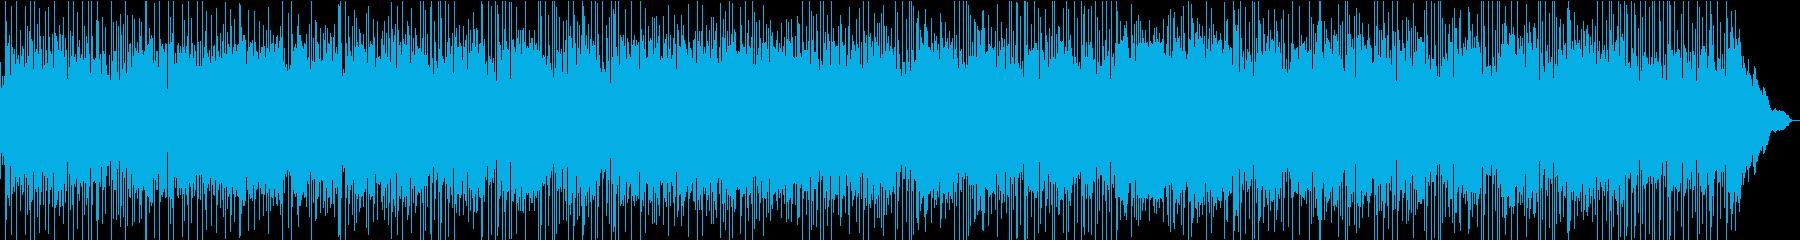 70sサウンド満載アメリカンシティポップの再生済みの波形